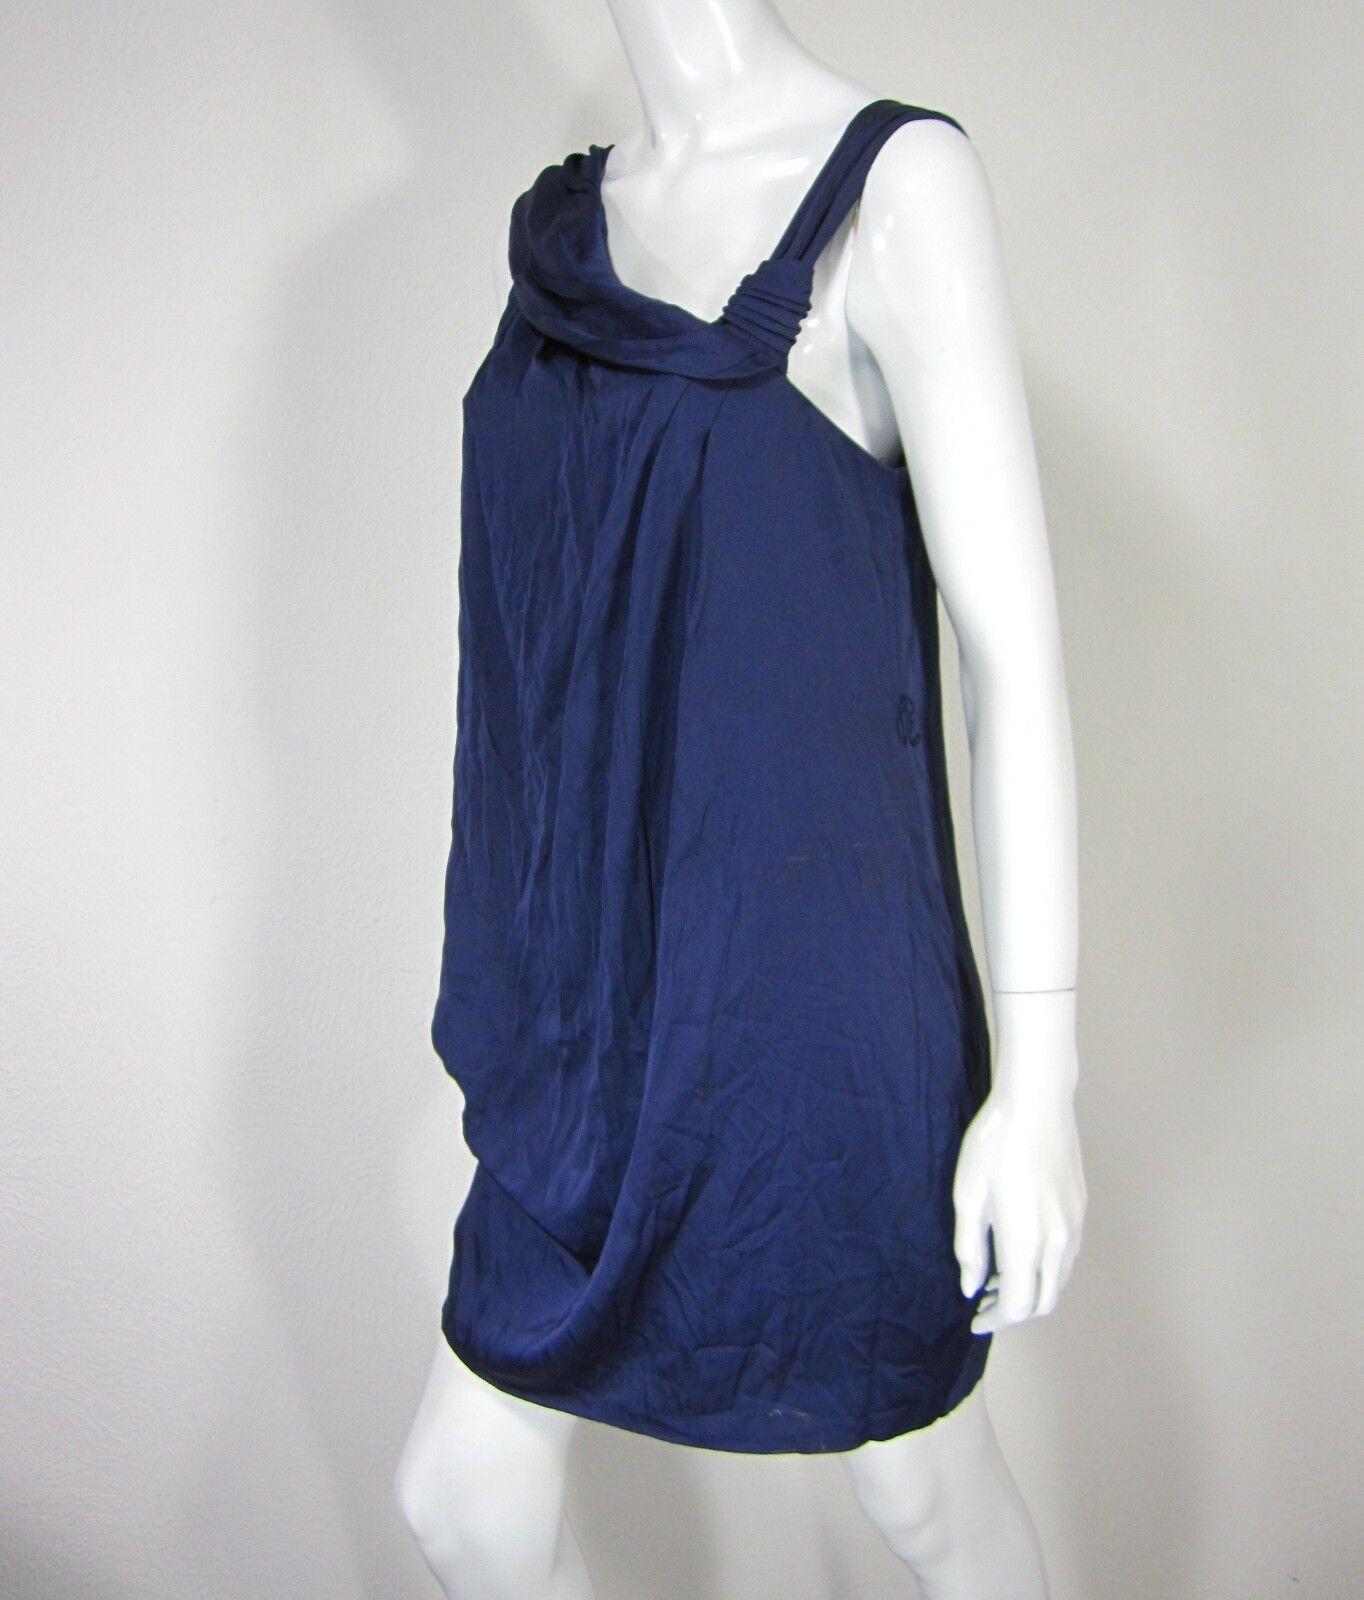 BCBG MAX AZARIA NWT SLEEVELESS DRESS Größe 6 SOLID Blau One Shoulder